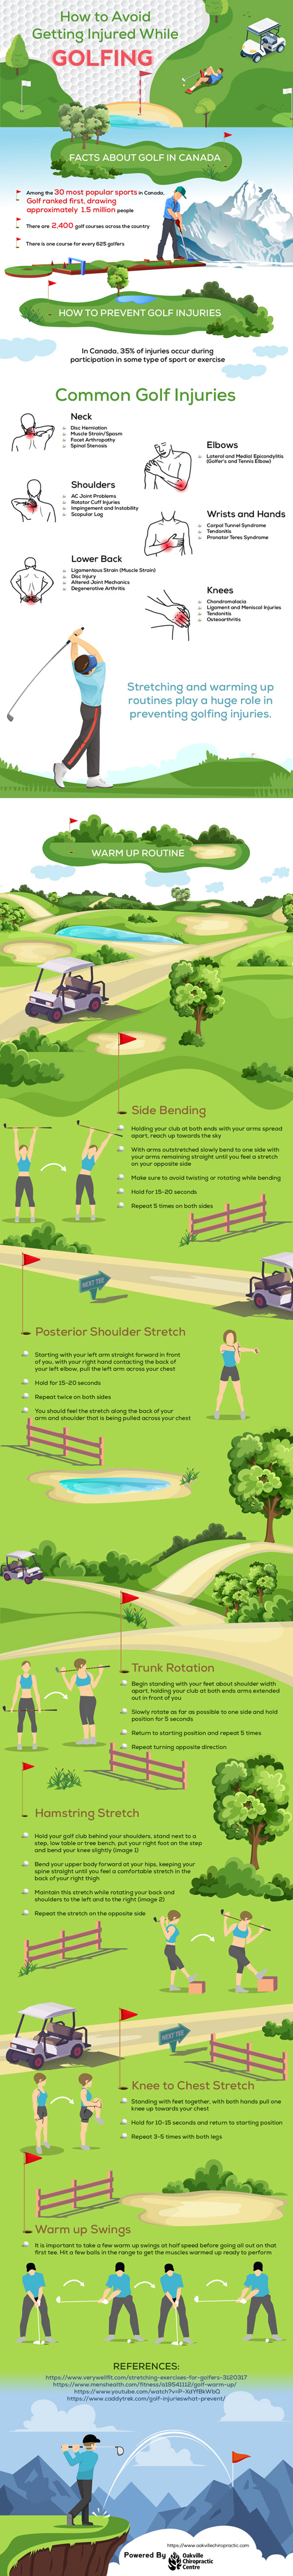 golfing infographic